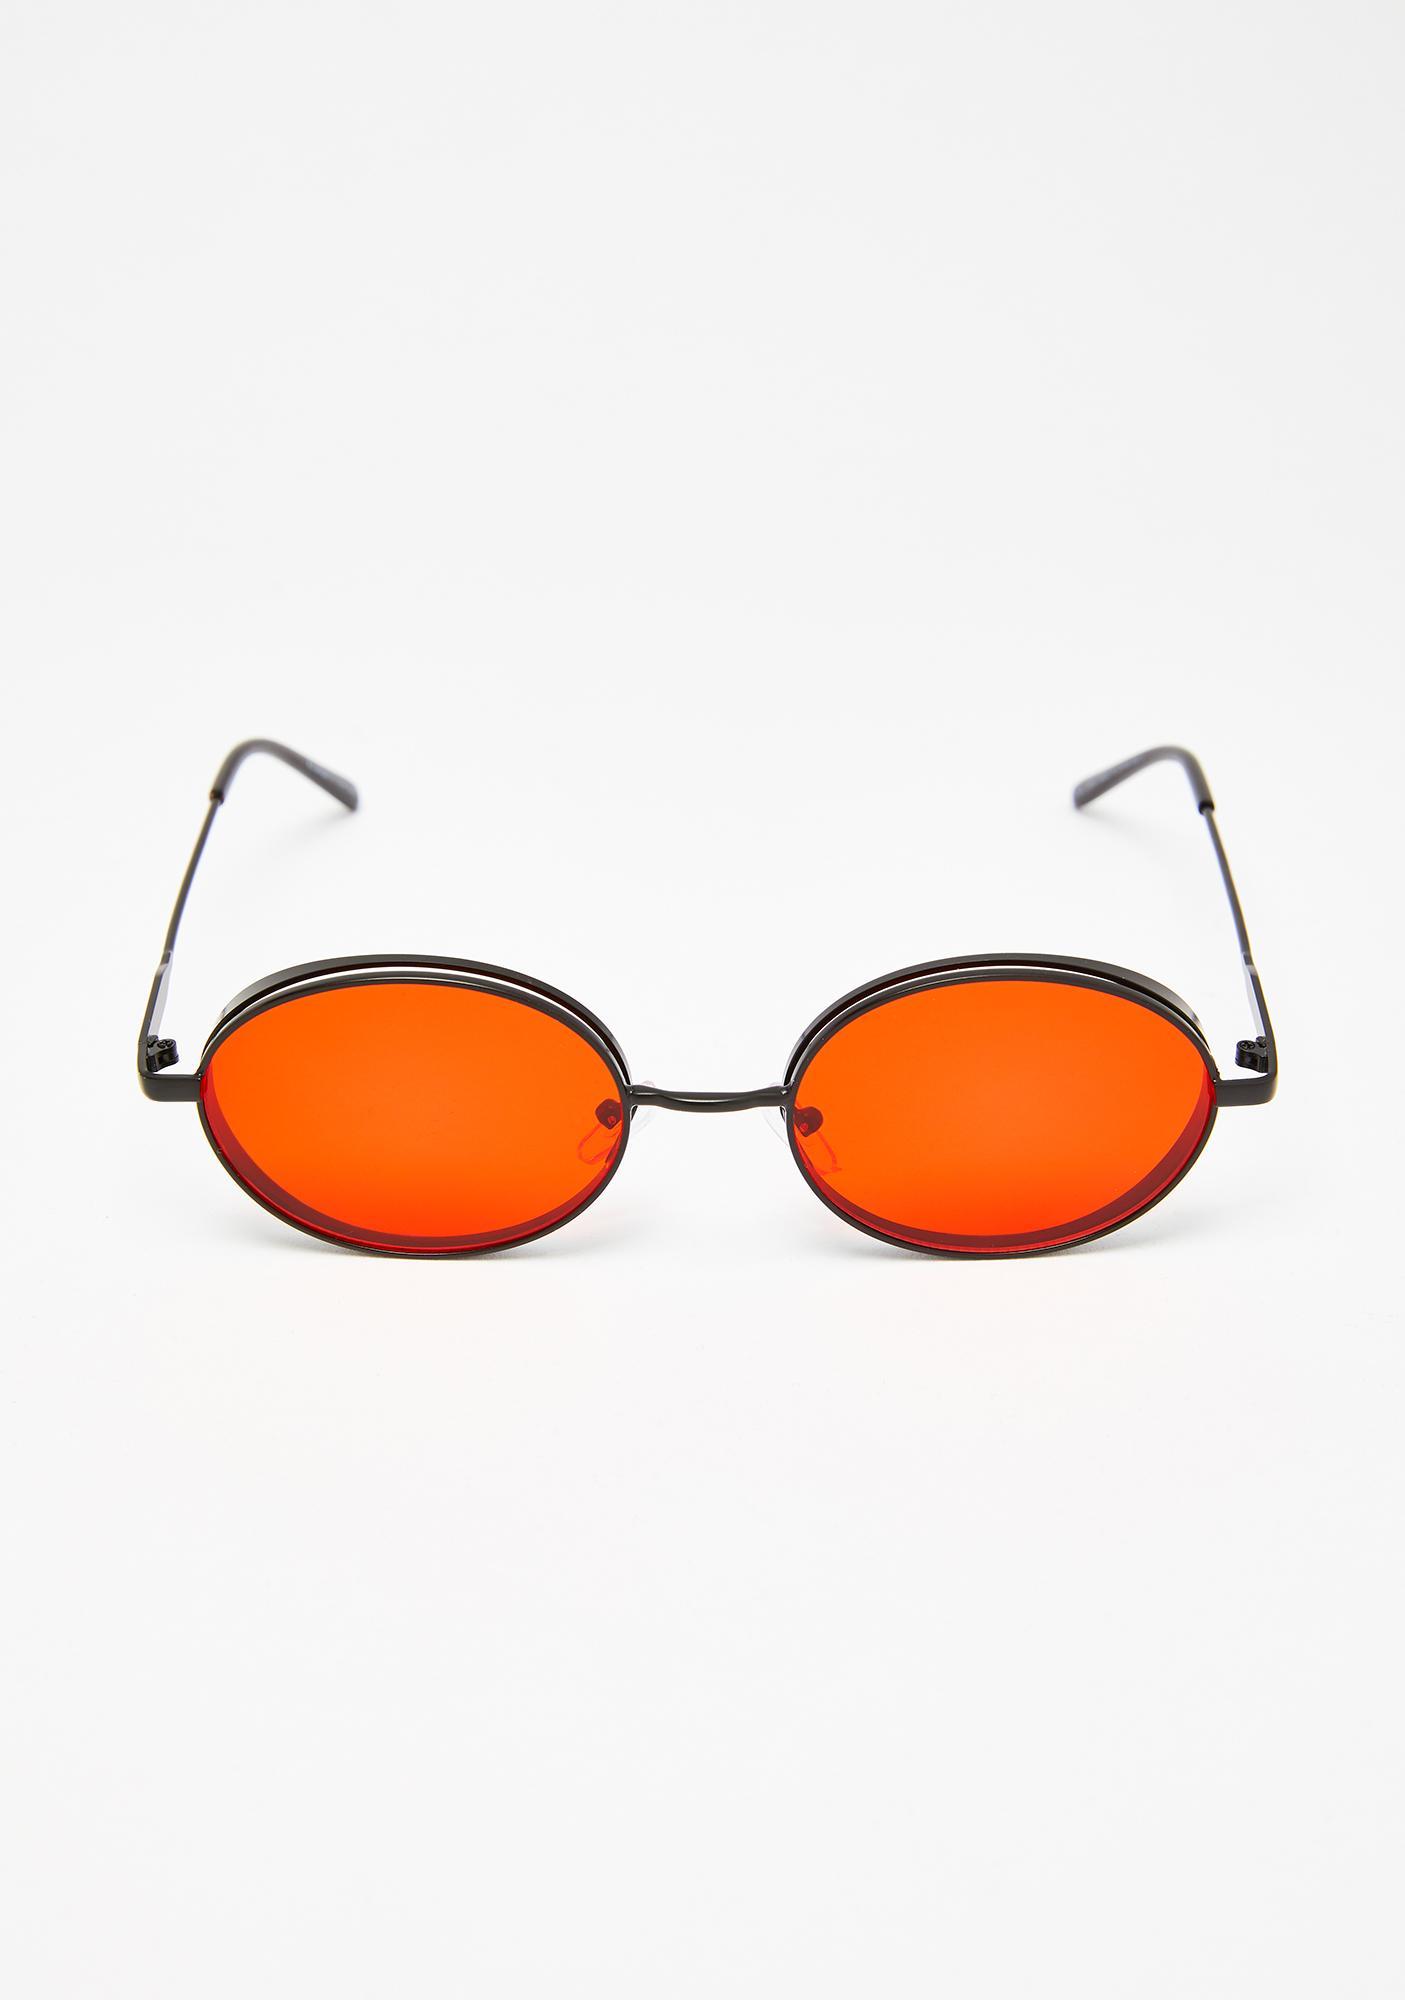 Hell Freak Oval Sunglasses